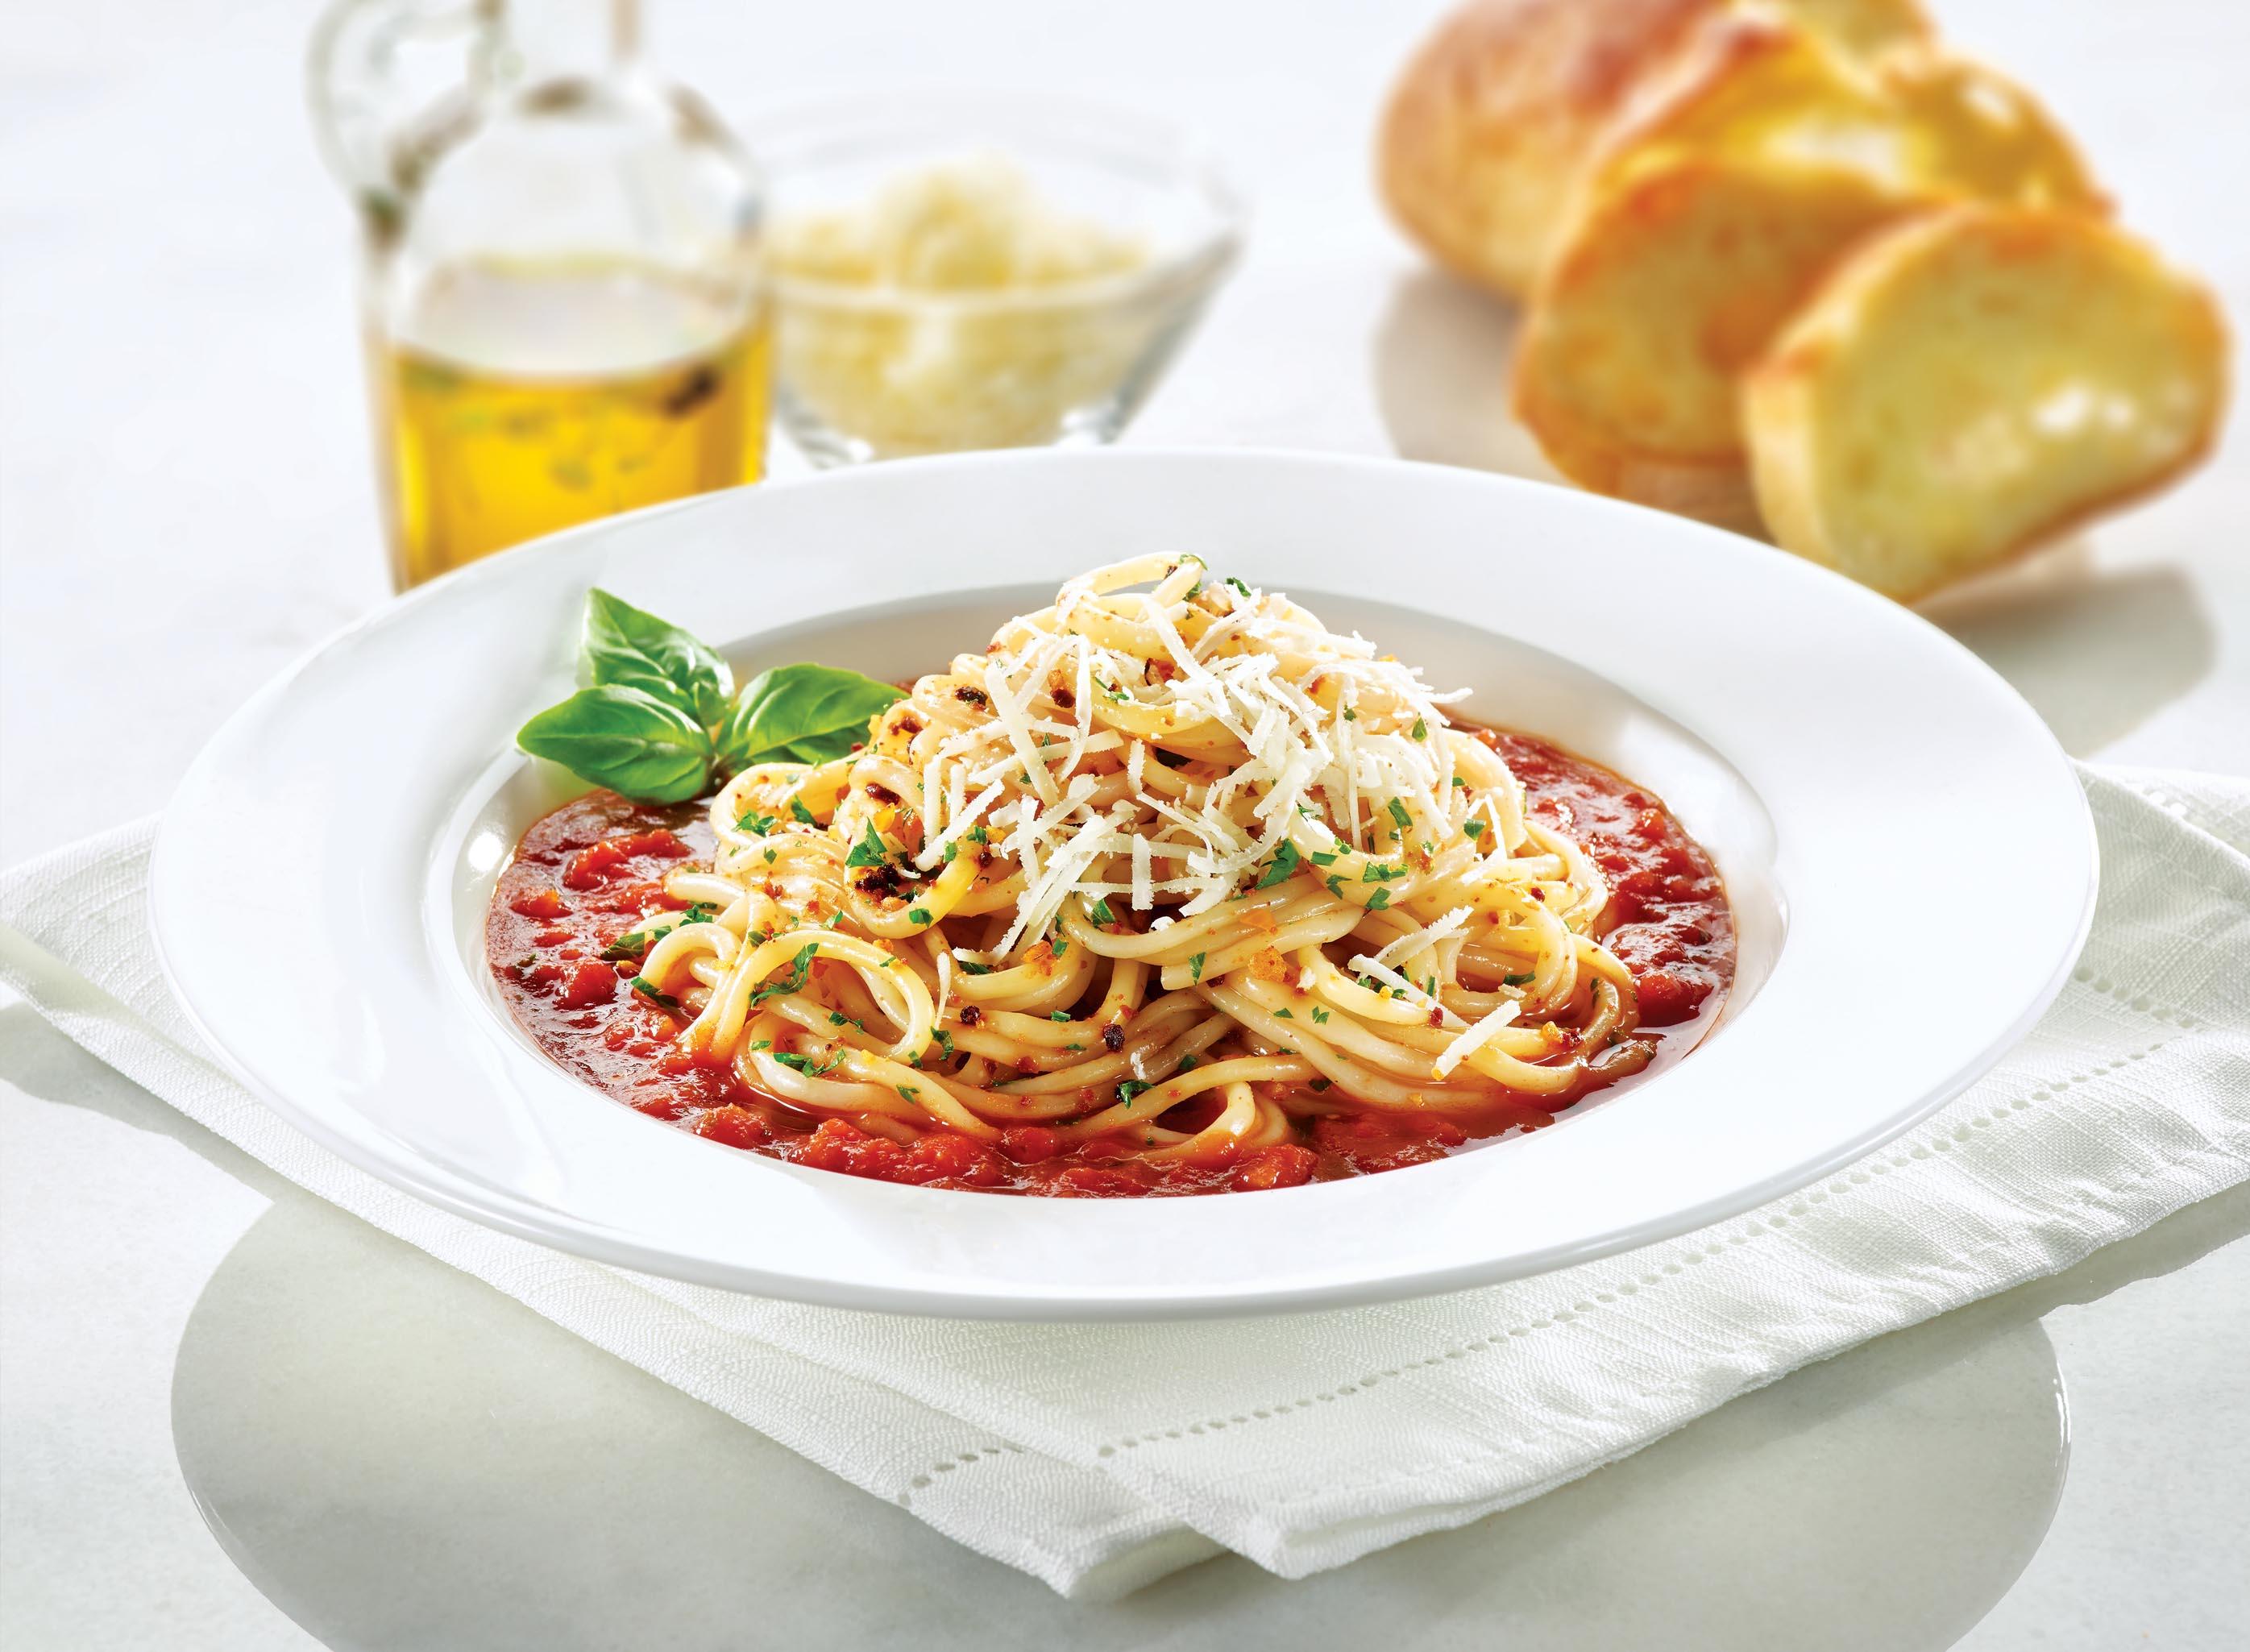 Tomato Basil Recipe Photo 2.0